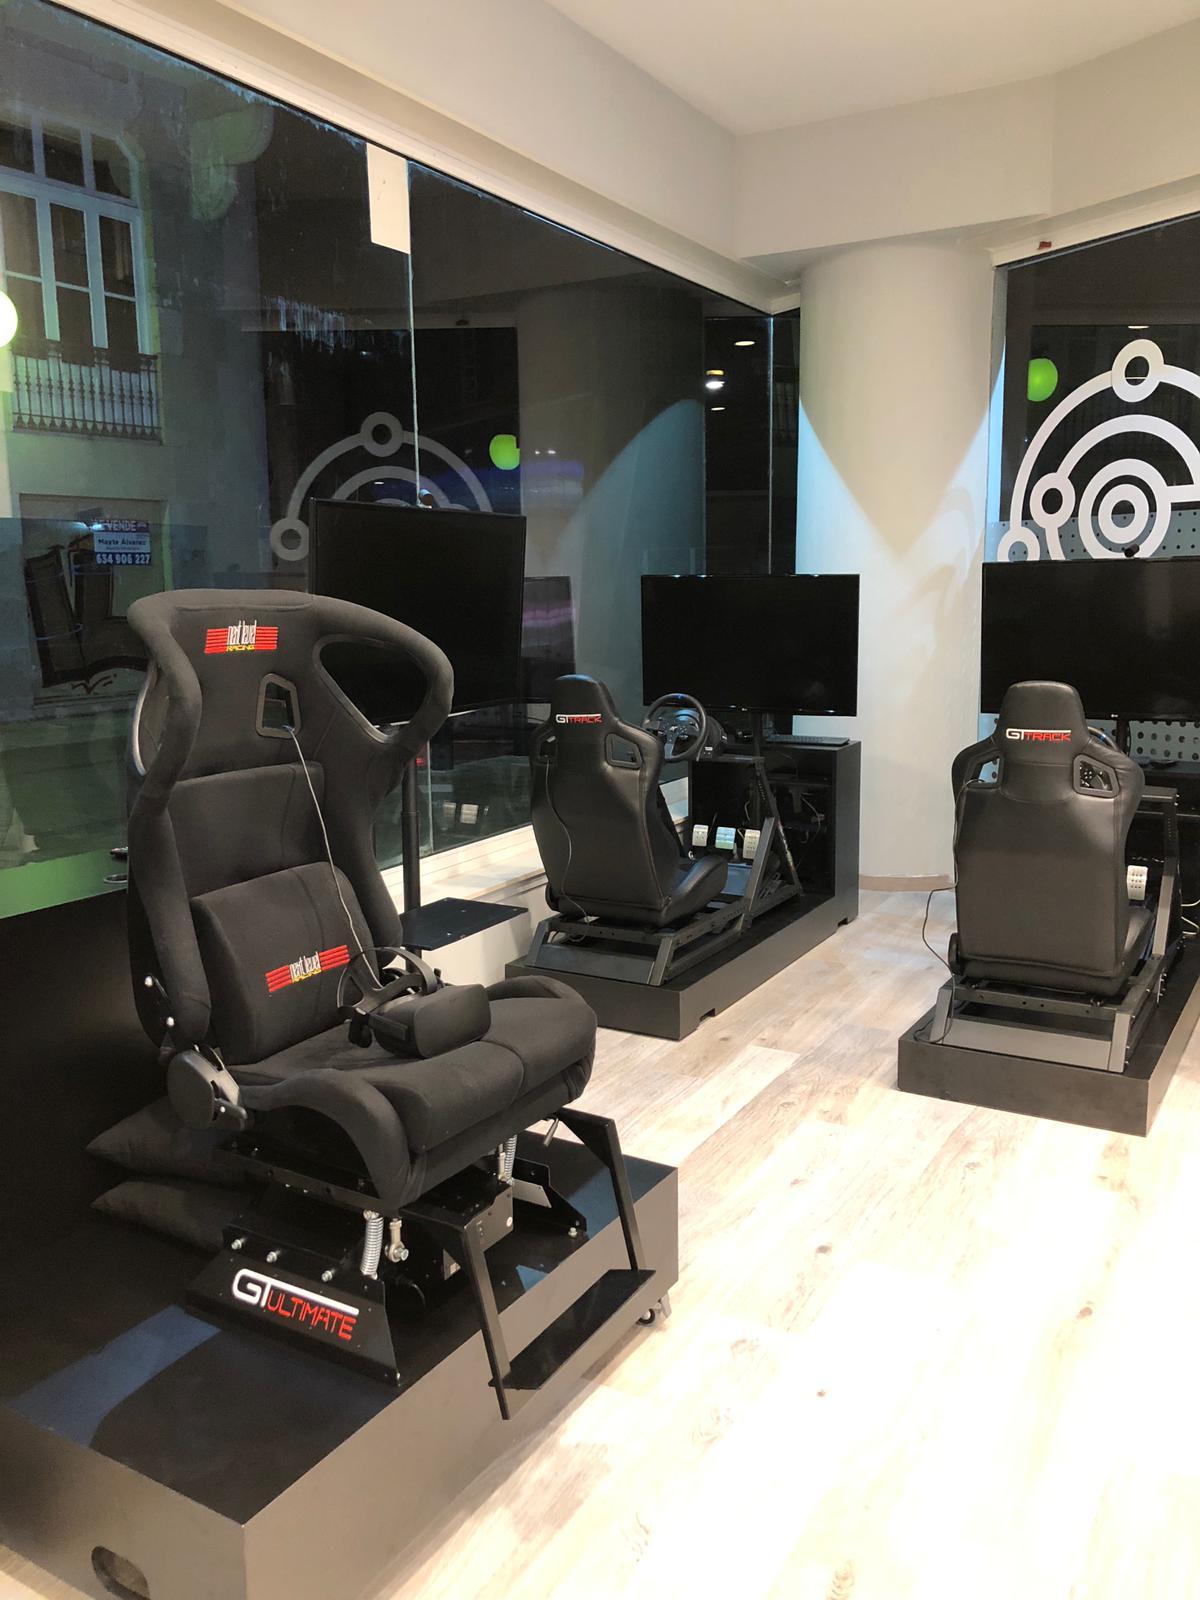 centros realidad virtual vigo